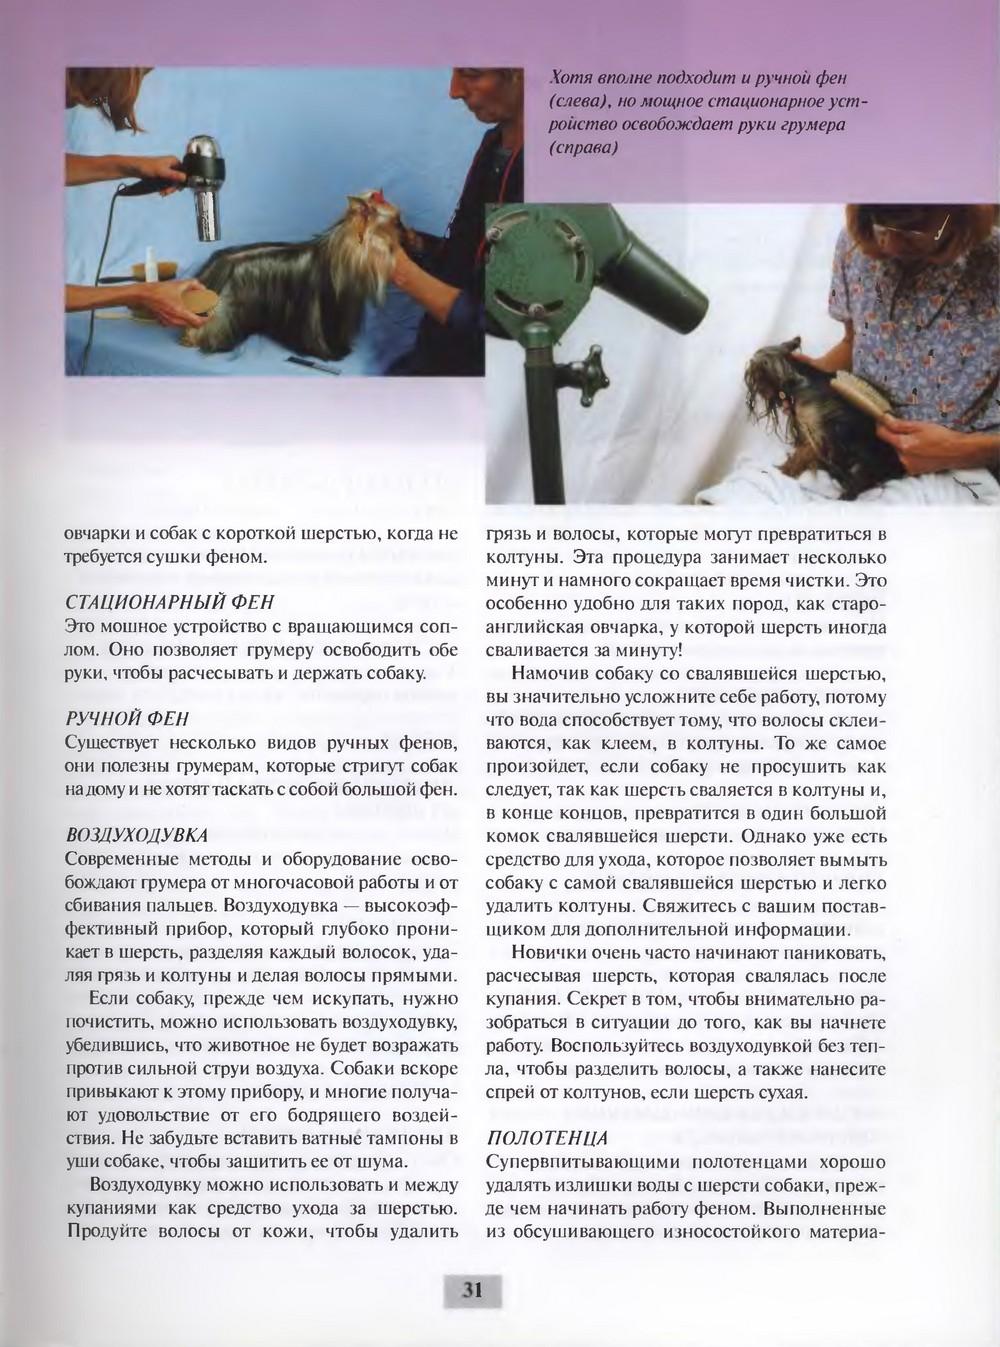 http://i6.imageban.ru/out/2013/11/29/51da2563d91e9c712fb0660d22e28b65.jpg